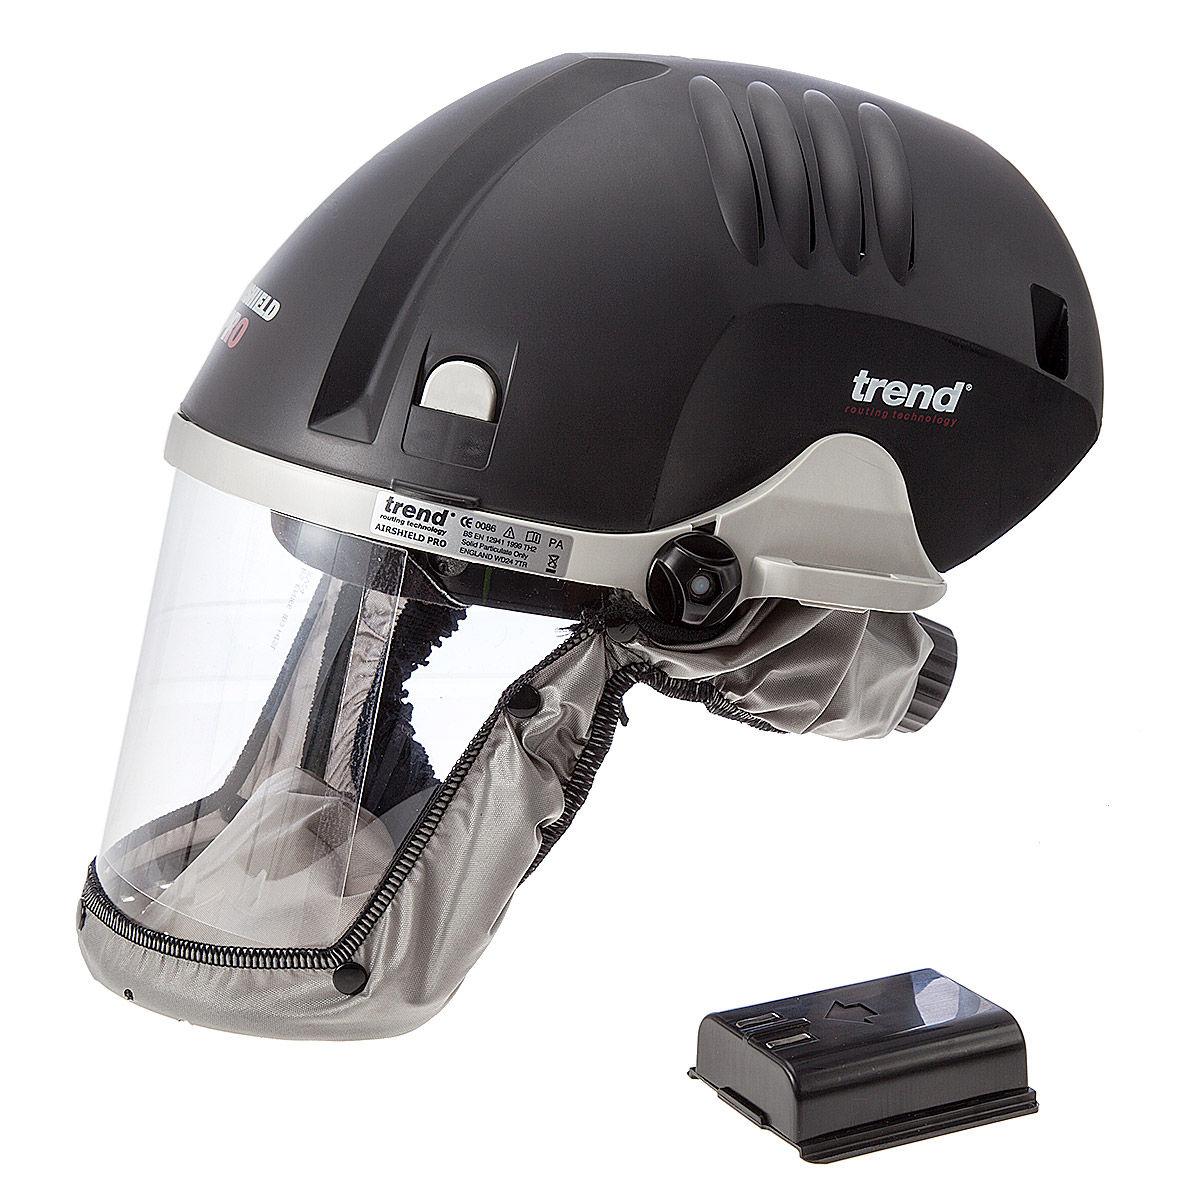 Trend AIR/PRO Airshield Pro Powered Respirator